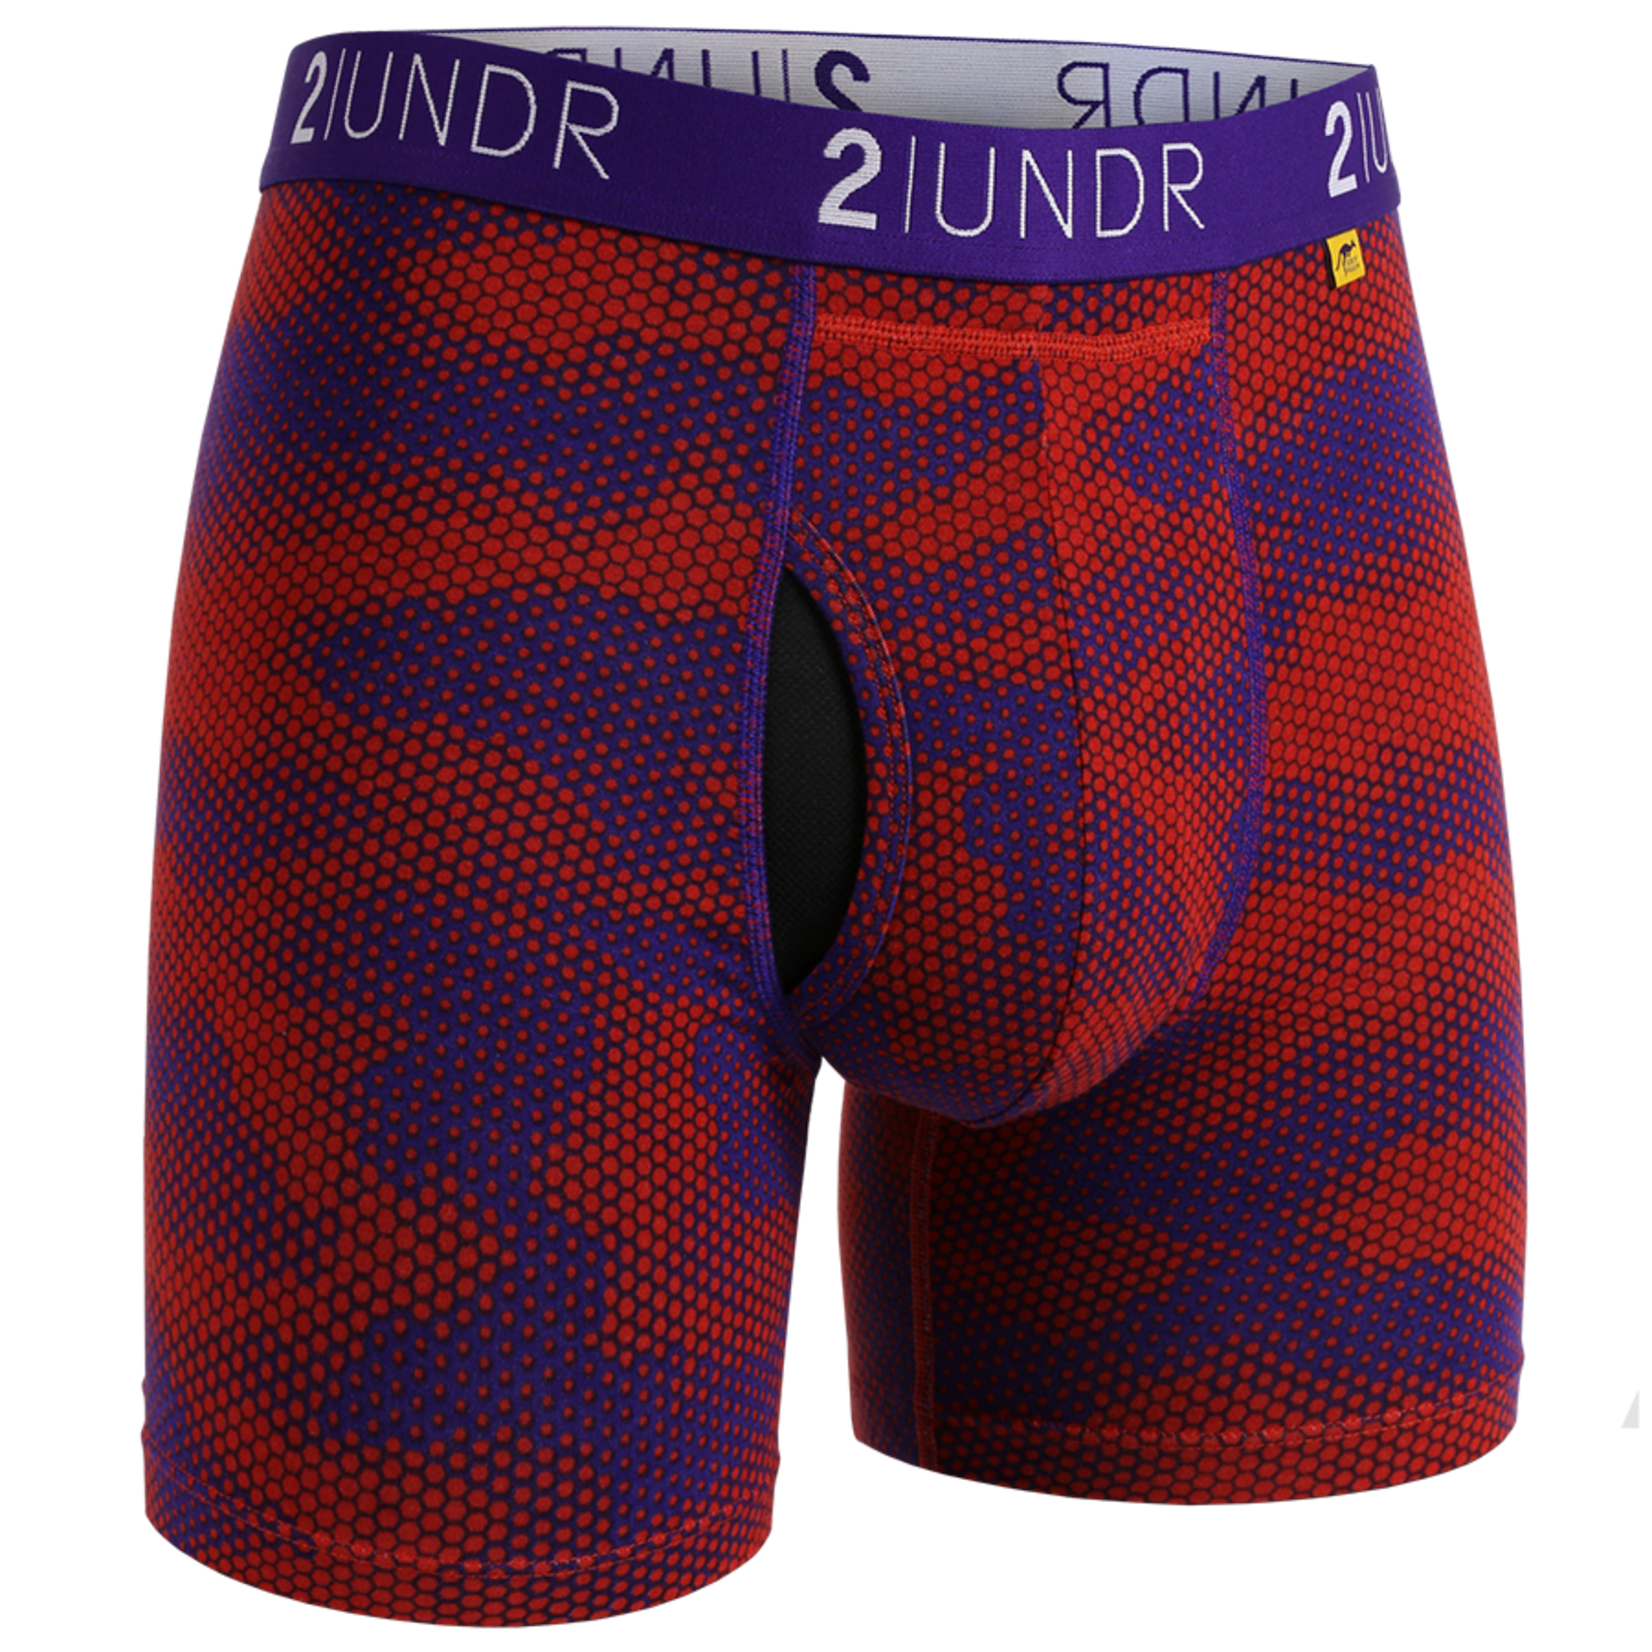 2UNDR 2UNDR Boxer Brief Prints